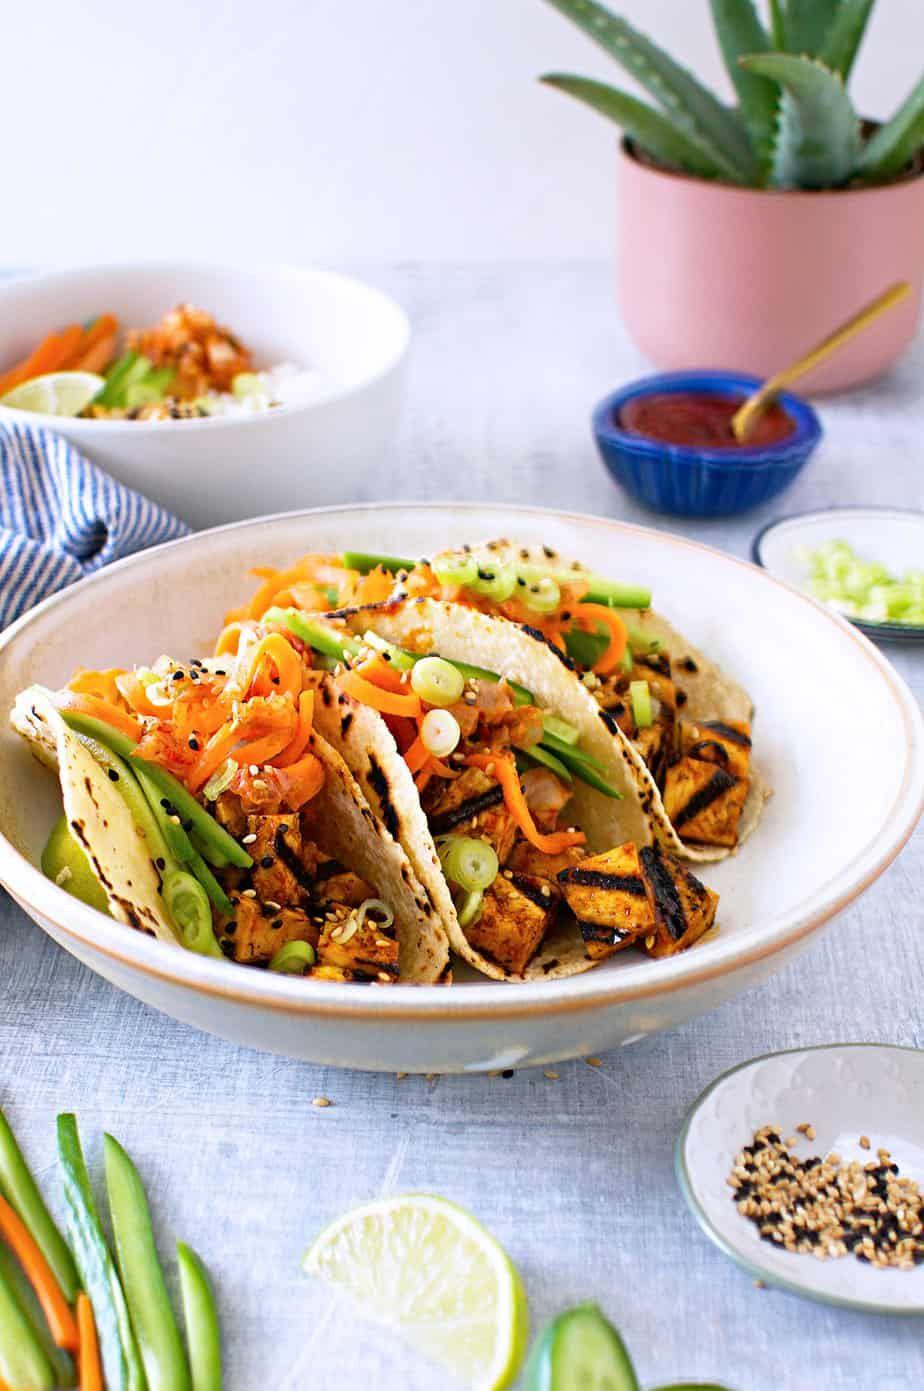 Grilled Tofu Tacos with Gochujang Glaze (Vegan and Gluten